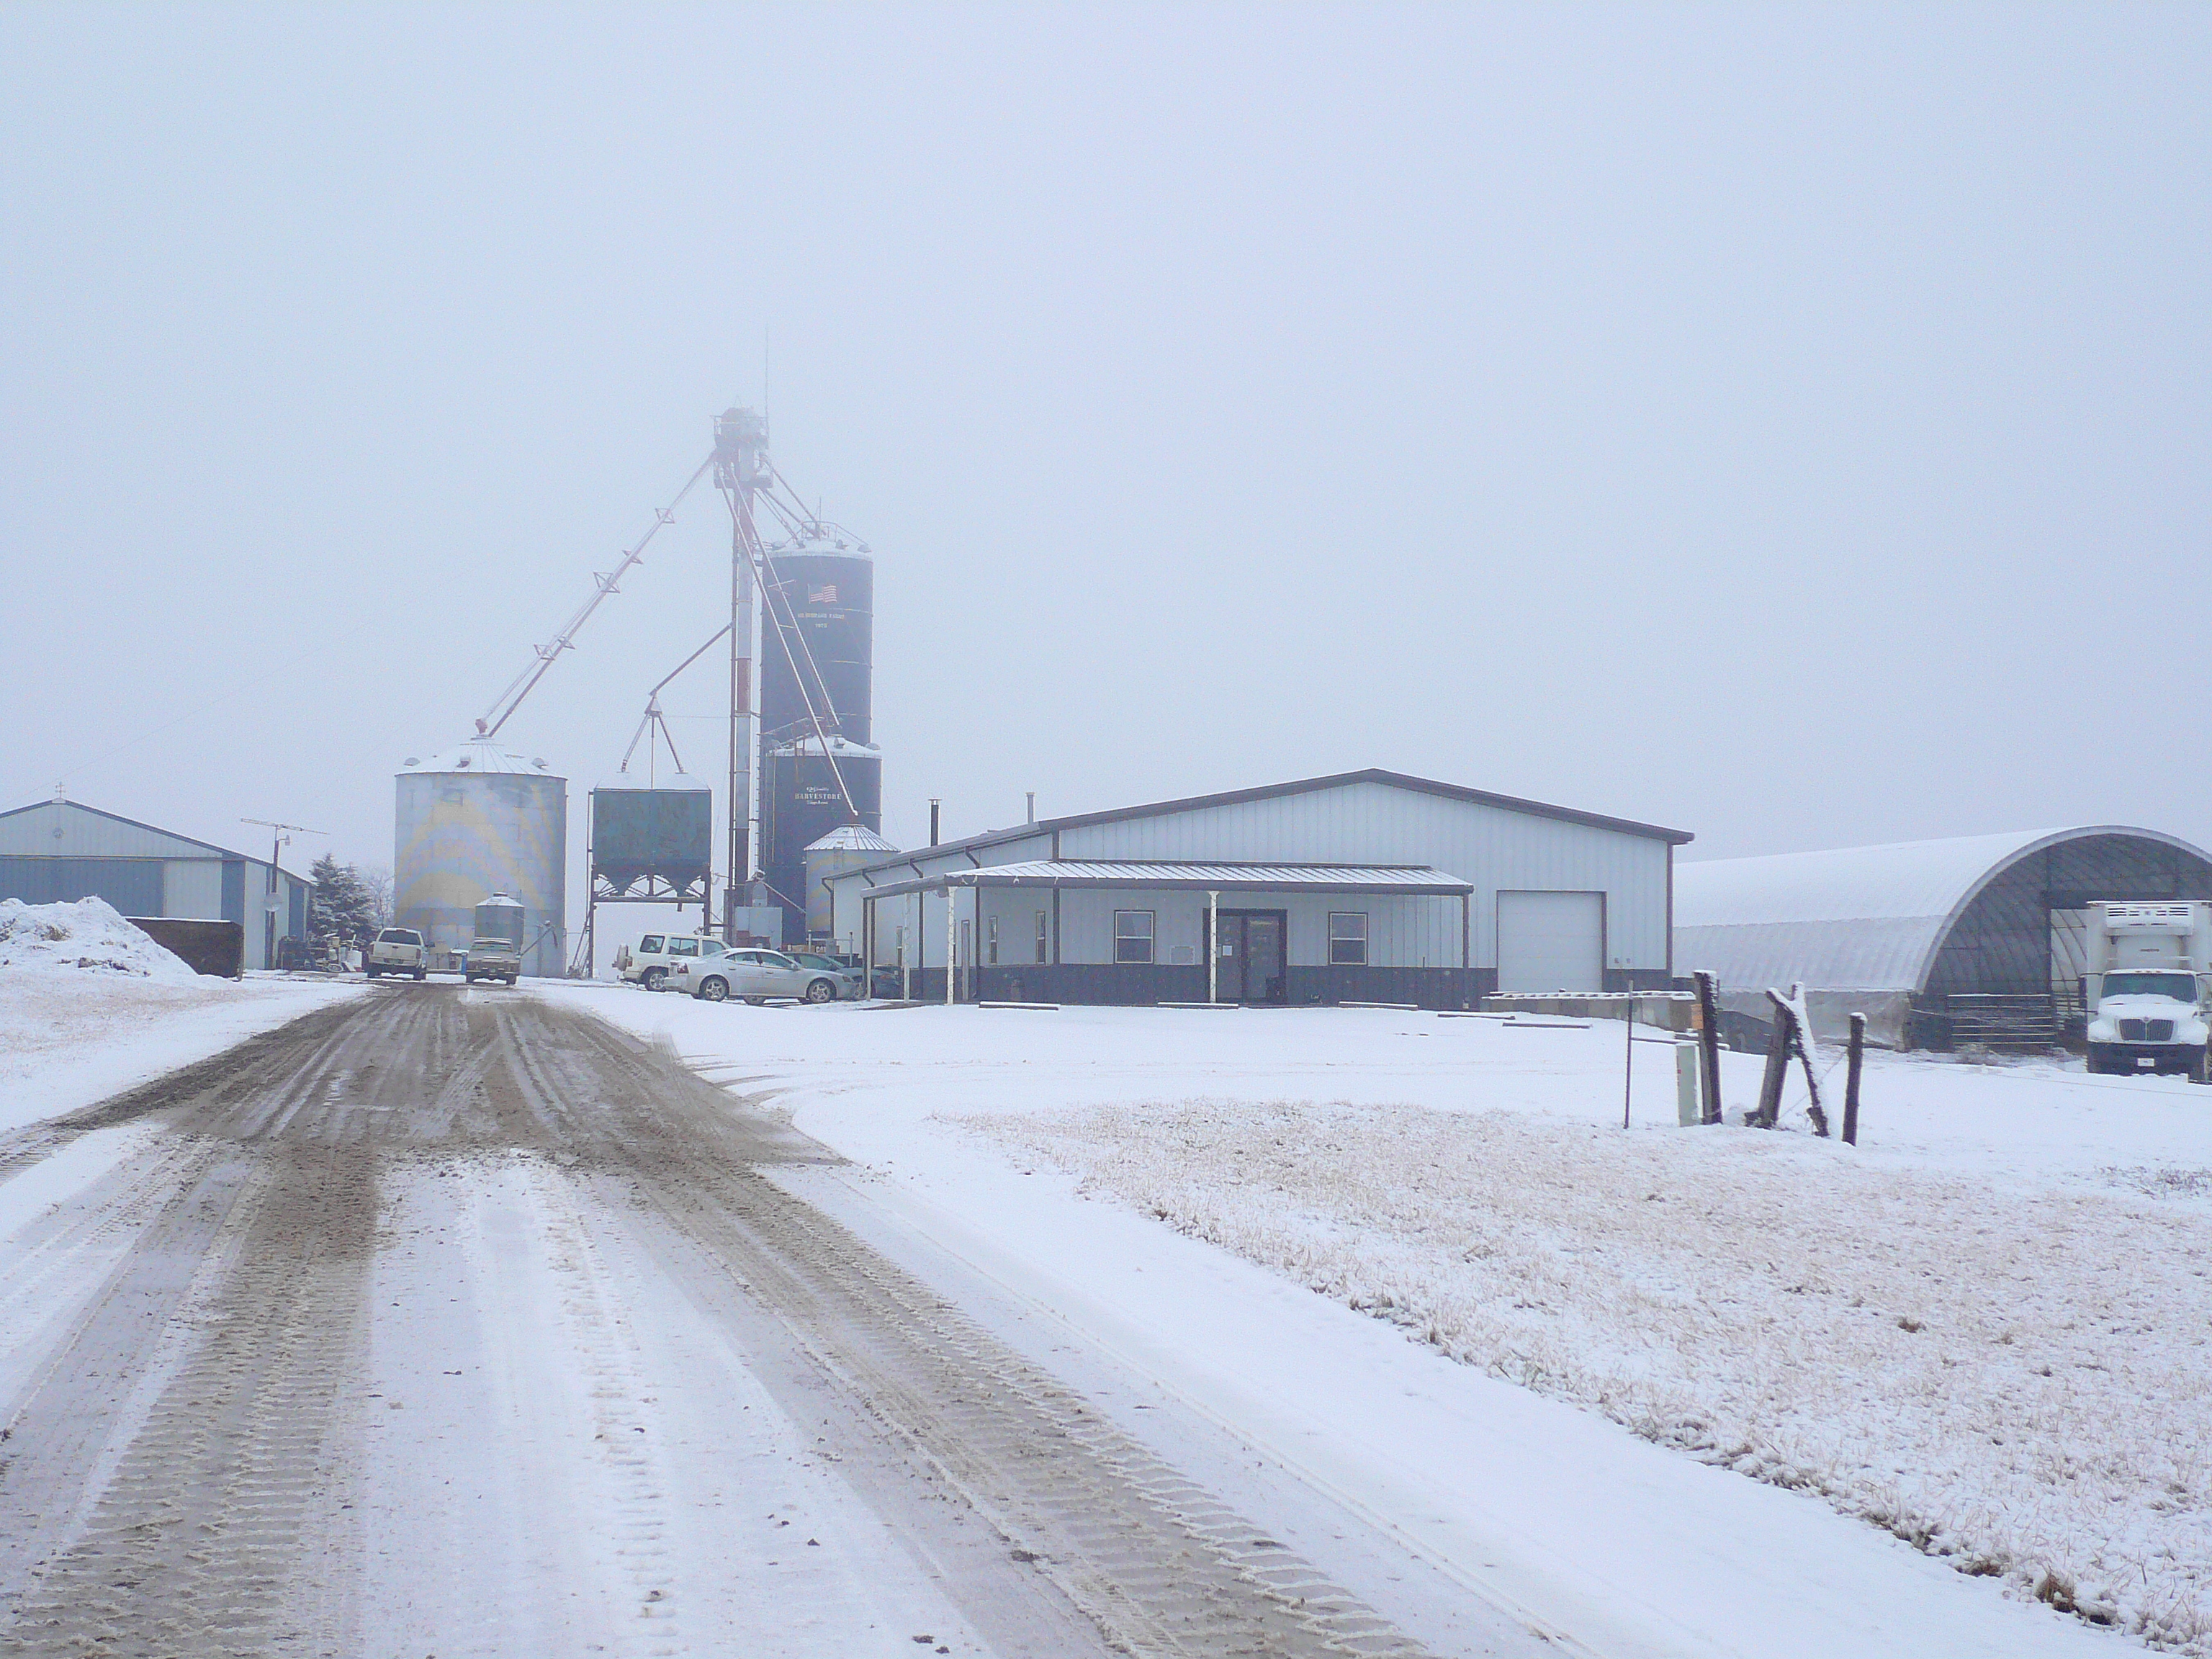 winter cow care